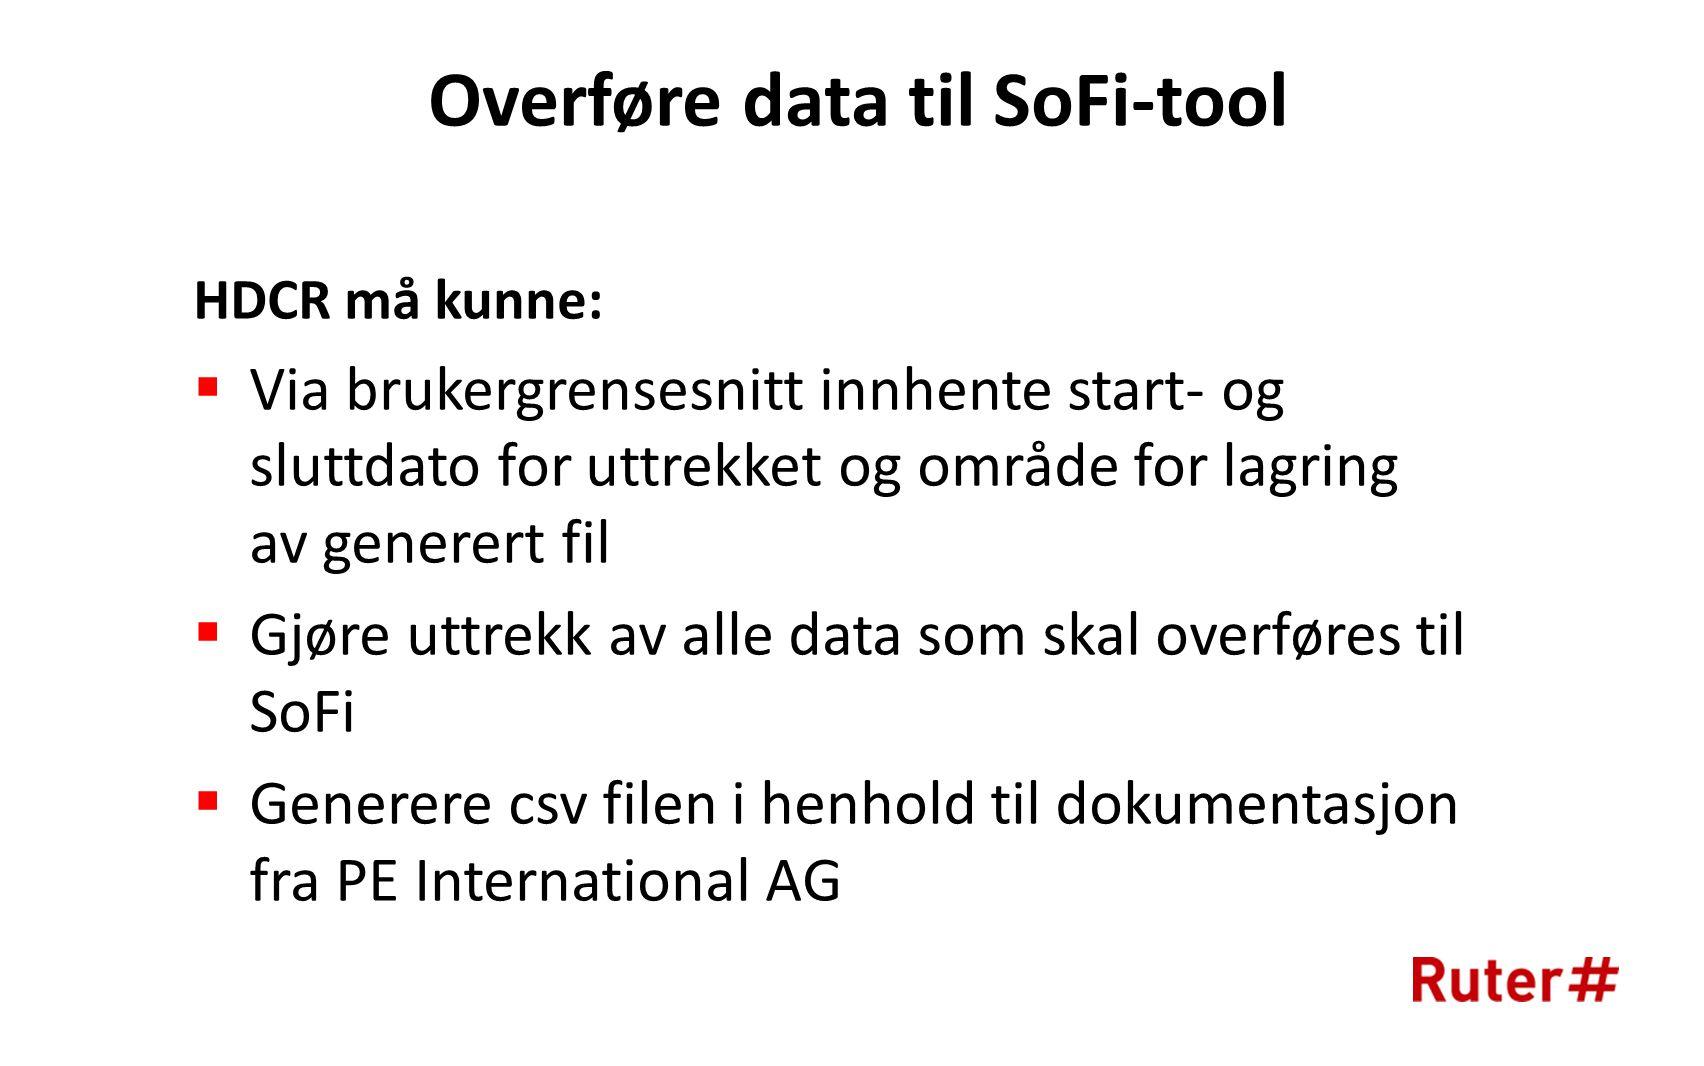 Overføre data til SoFi-tool